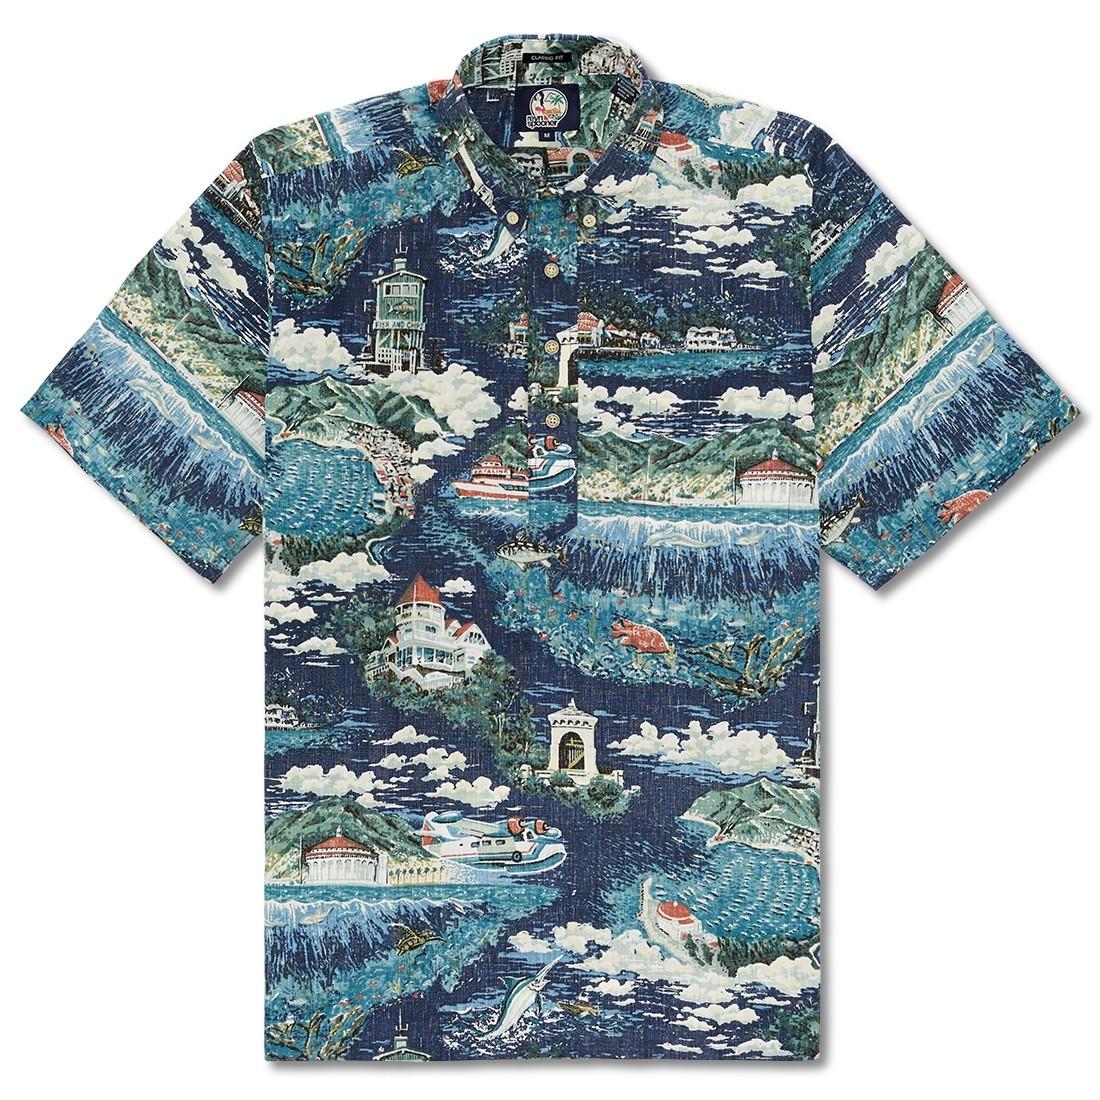 'Avalon By The Sea' 2018 Shirt